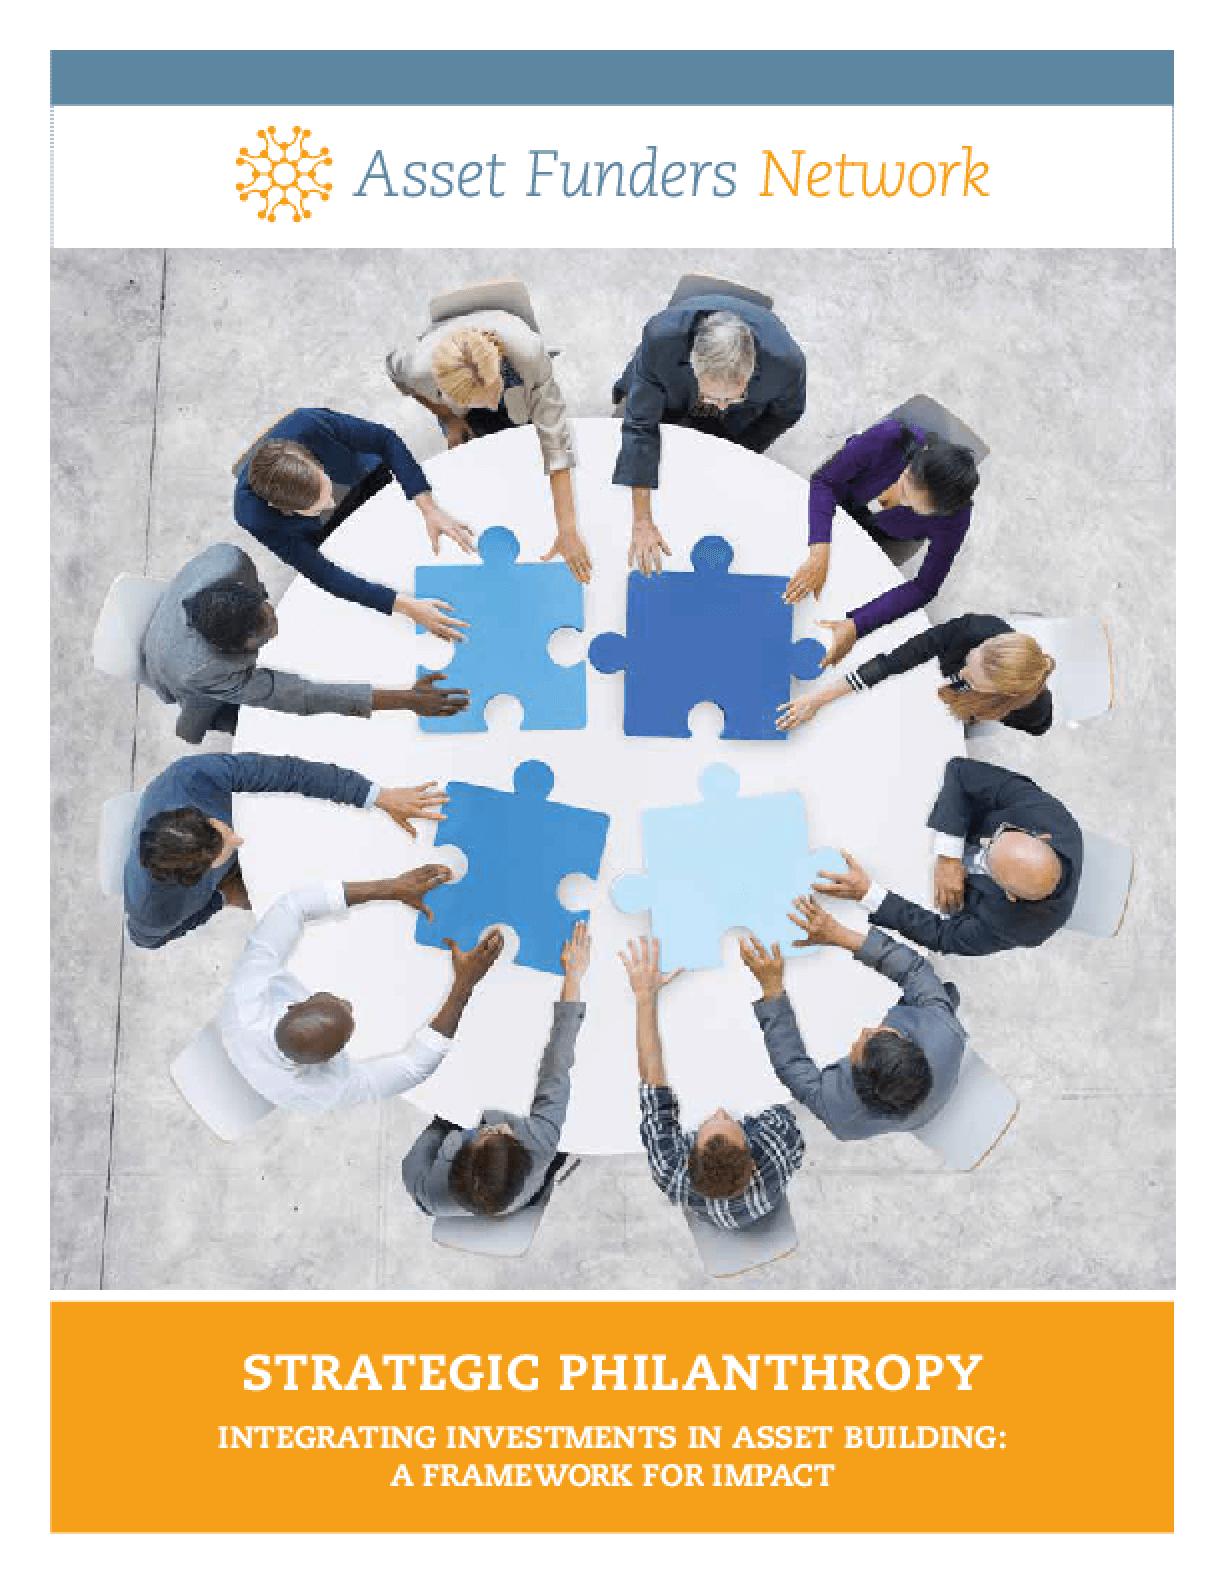 Strategic Philanthropy Integrating Investments In Asset Building: A Framework for Impact